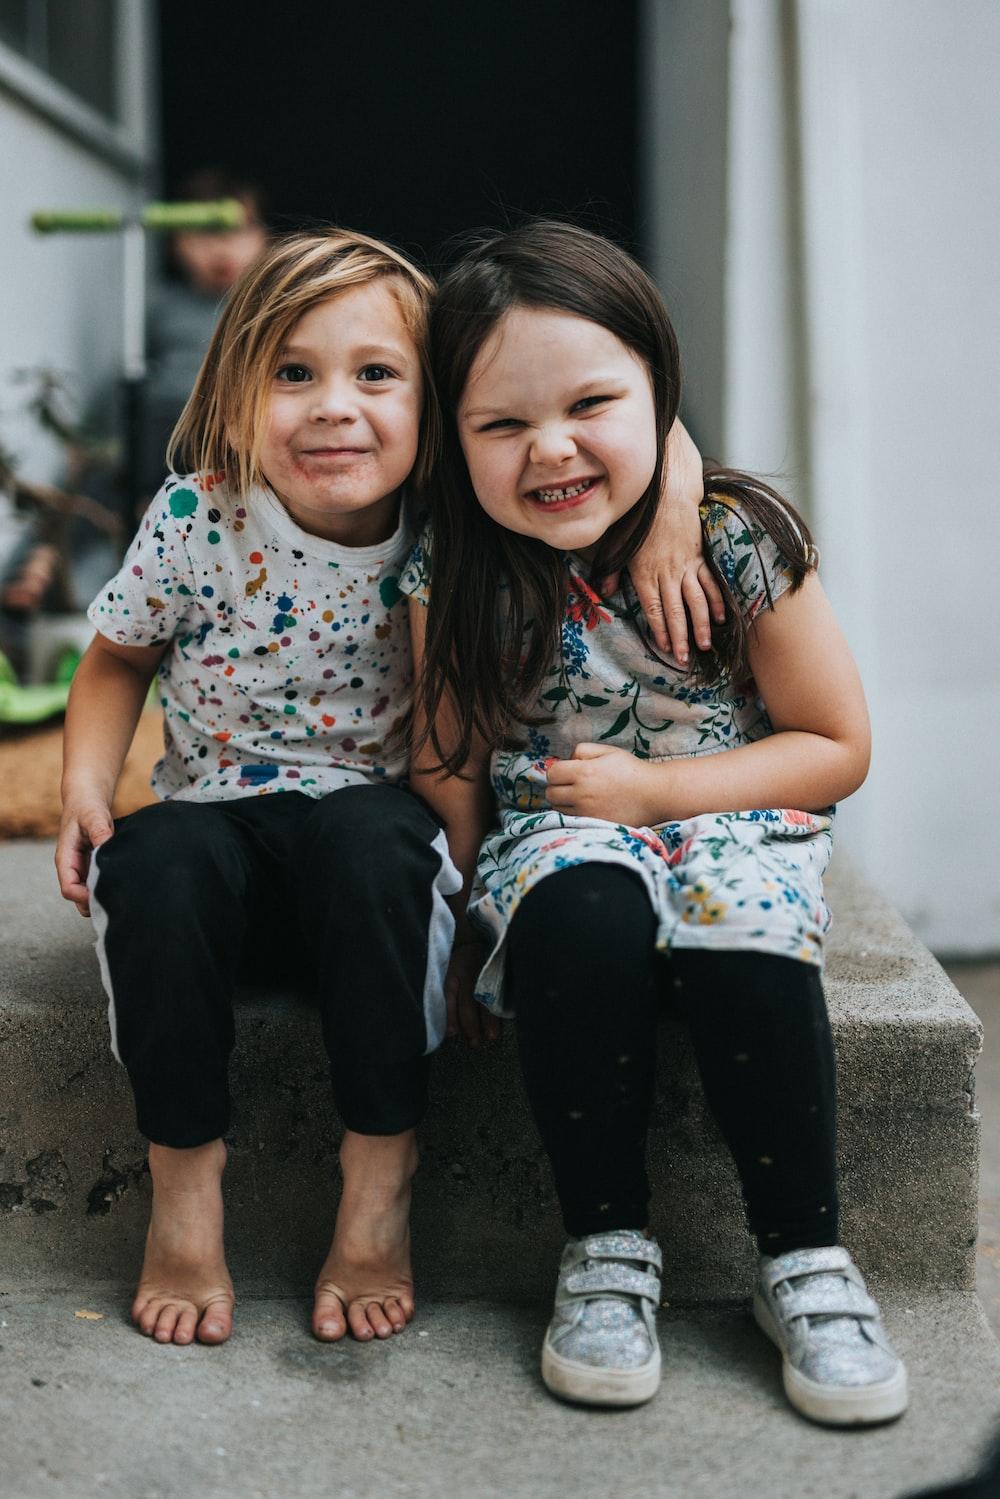 2 girls sitting on concrete floor